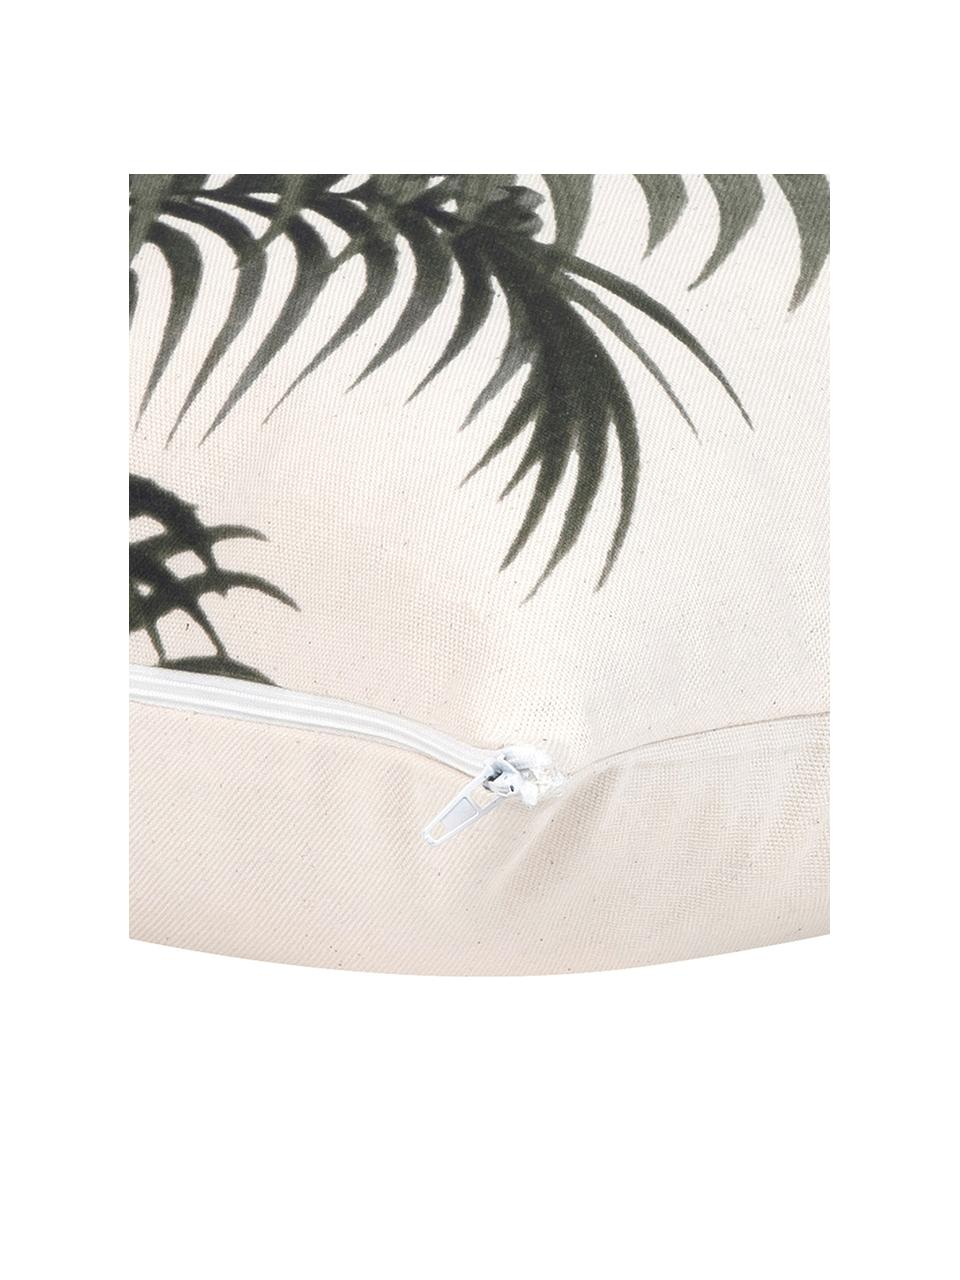 Kissenhülle Palmeira mit Palmenprint, 100% Baumwolle, Ecru, Grün, 40 x 40 cm